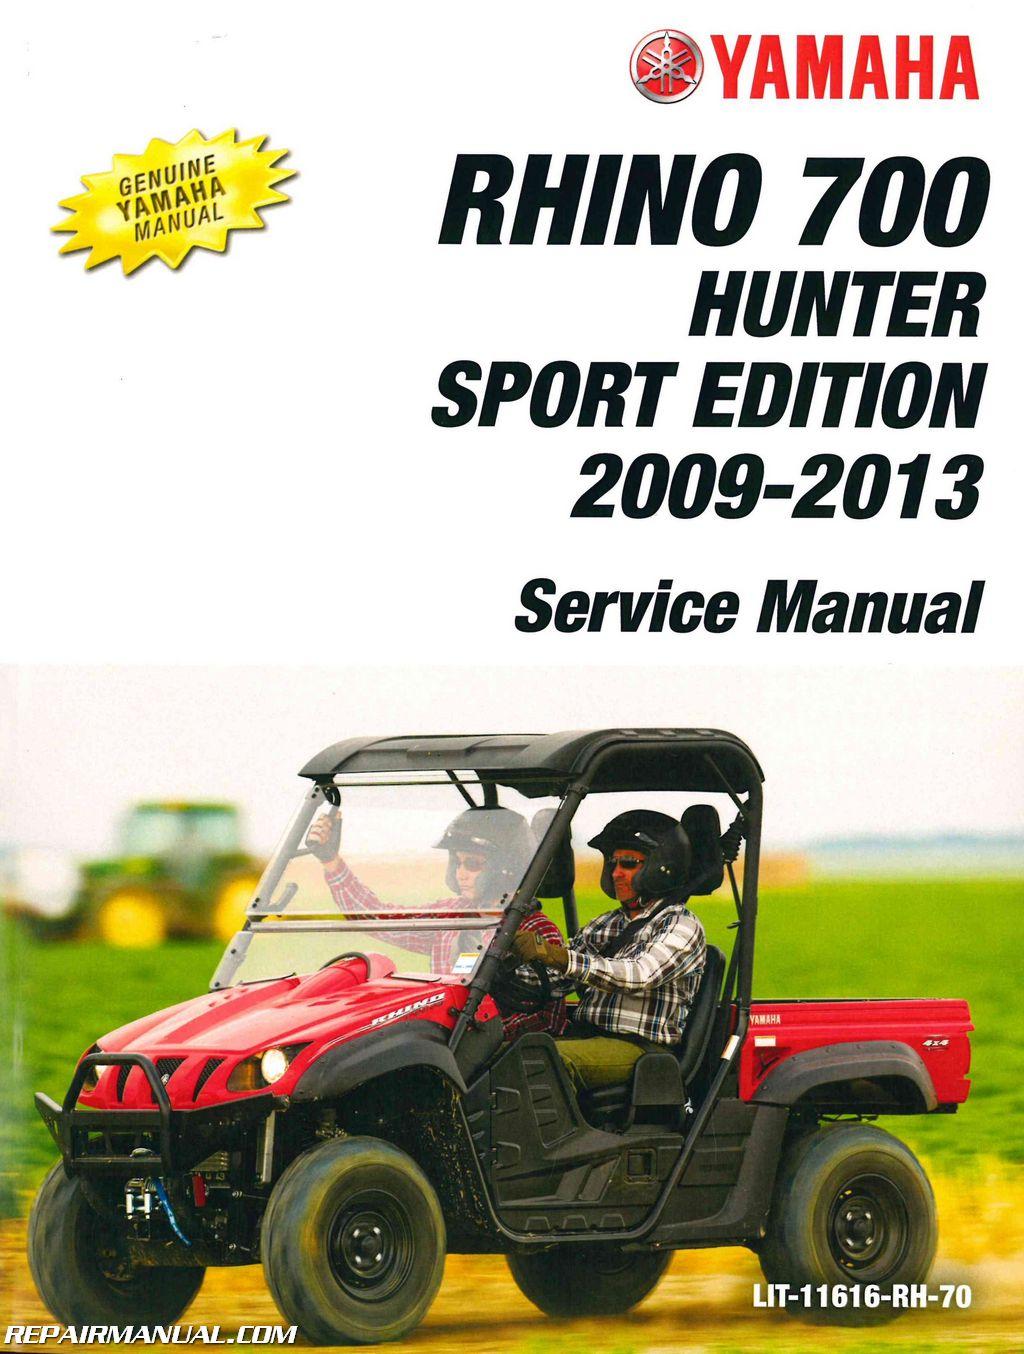 2006 yamaha grizzly 700 manual